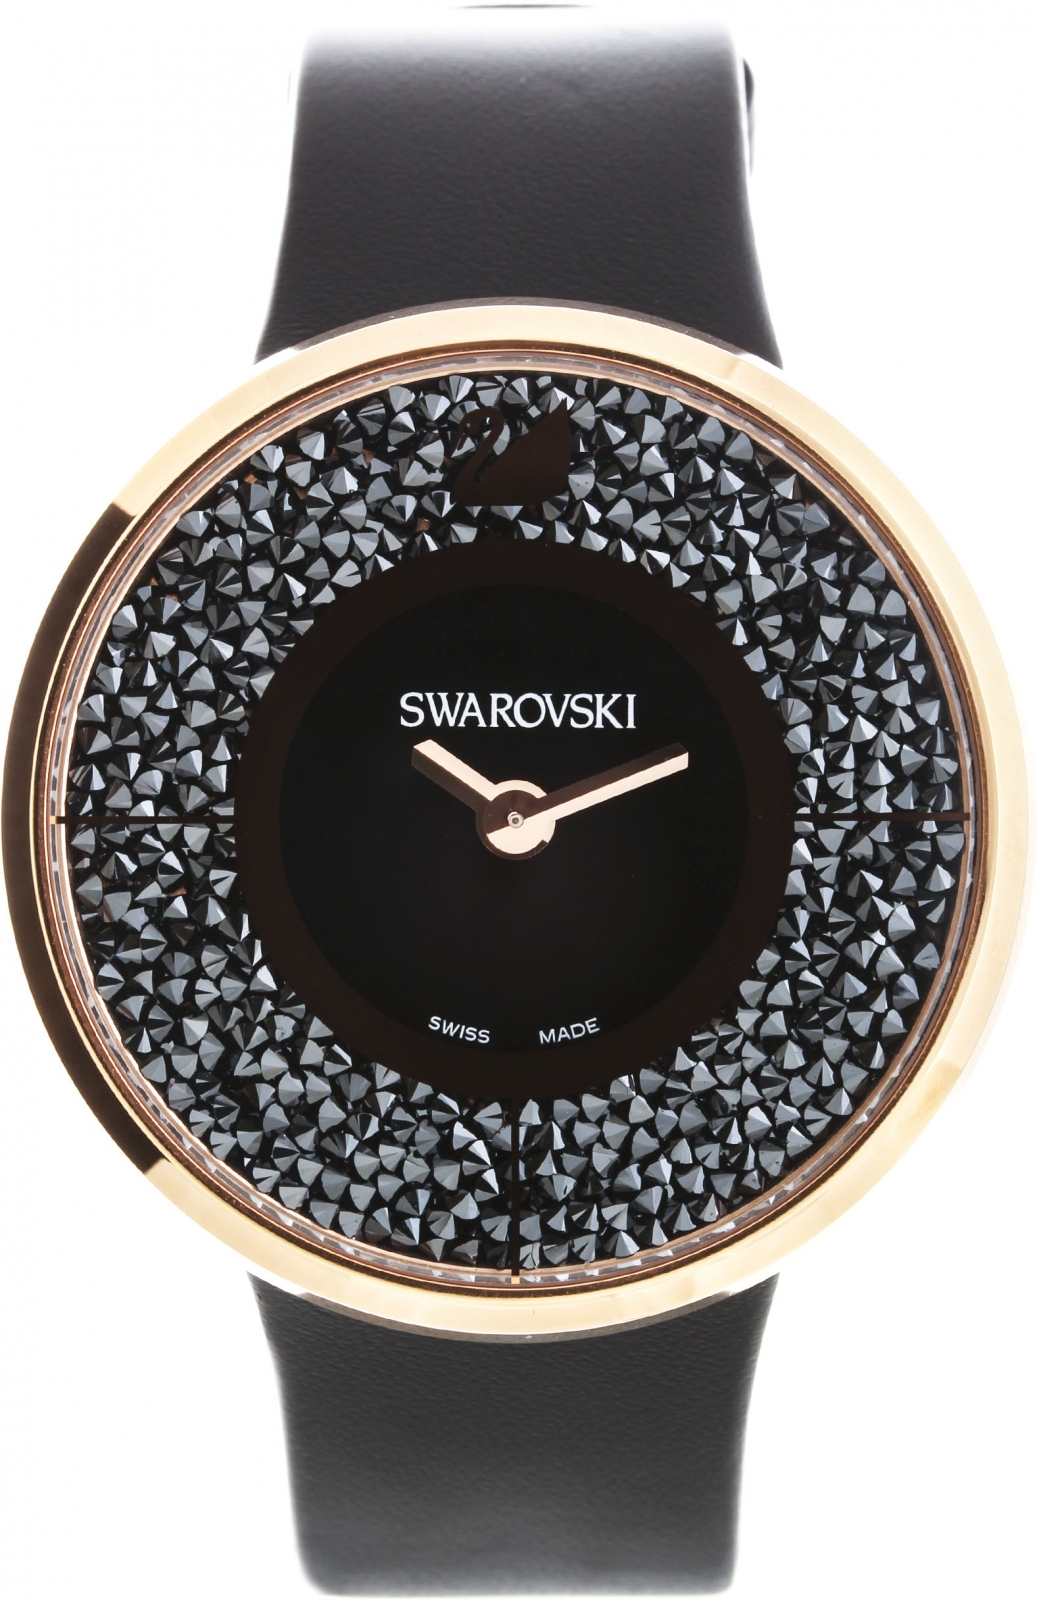 Swarovski Crystalline Black Rose Gold Tone 5045371Наручные часы<br>Швейцарские часы Swarovski Crystalline Black Rose Gold Tone 5045371<br><br>Пол: Женские<br>Страна-производитель: Швейцария<br>Механизм: Кварцевый<br>Материал корпуса: Сталь<br>Материал ремня/браслета: Кожа<br>Водозащита, диапазон: 20 - 100 м<br>Стекло: Сапфировое<br>Толщина корпуса: None<br>Стиль: Мода